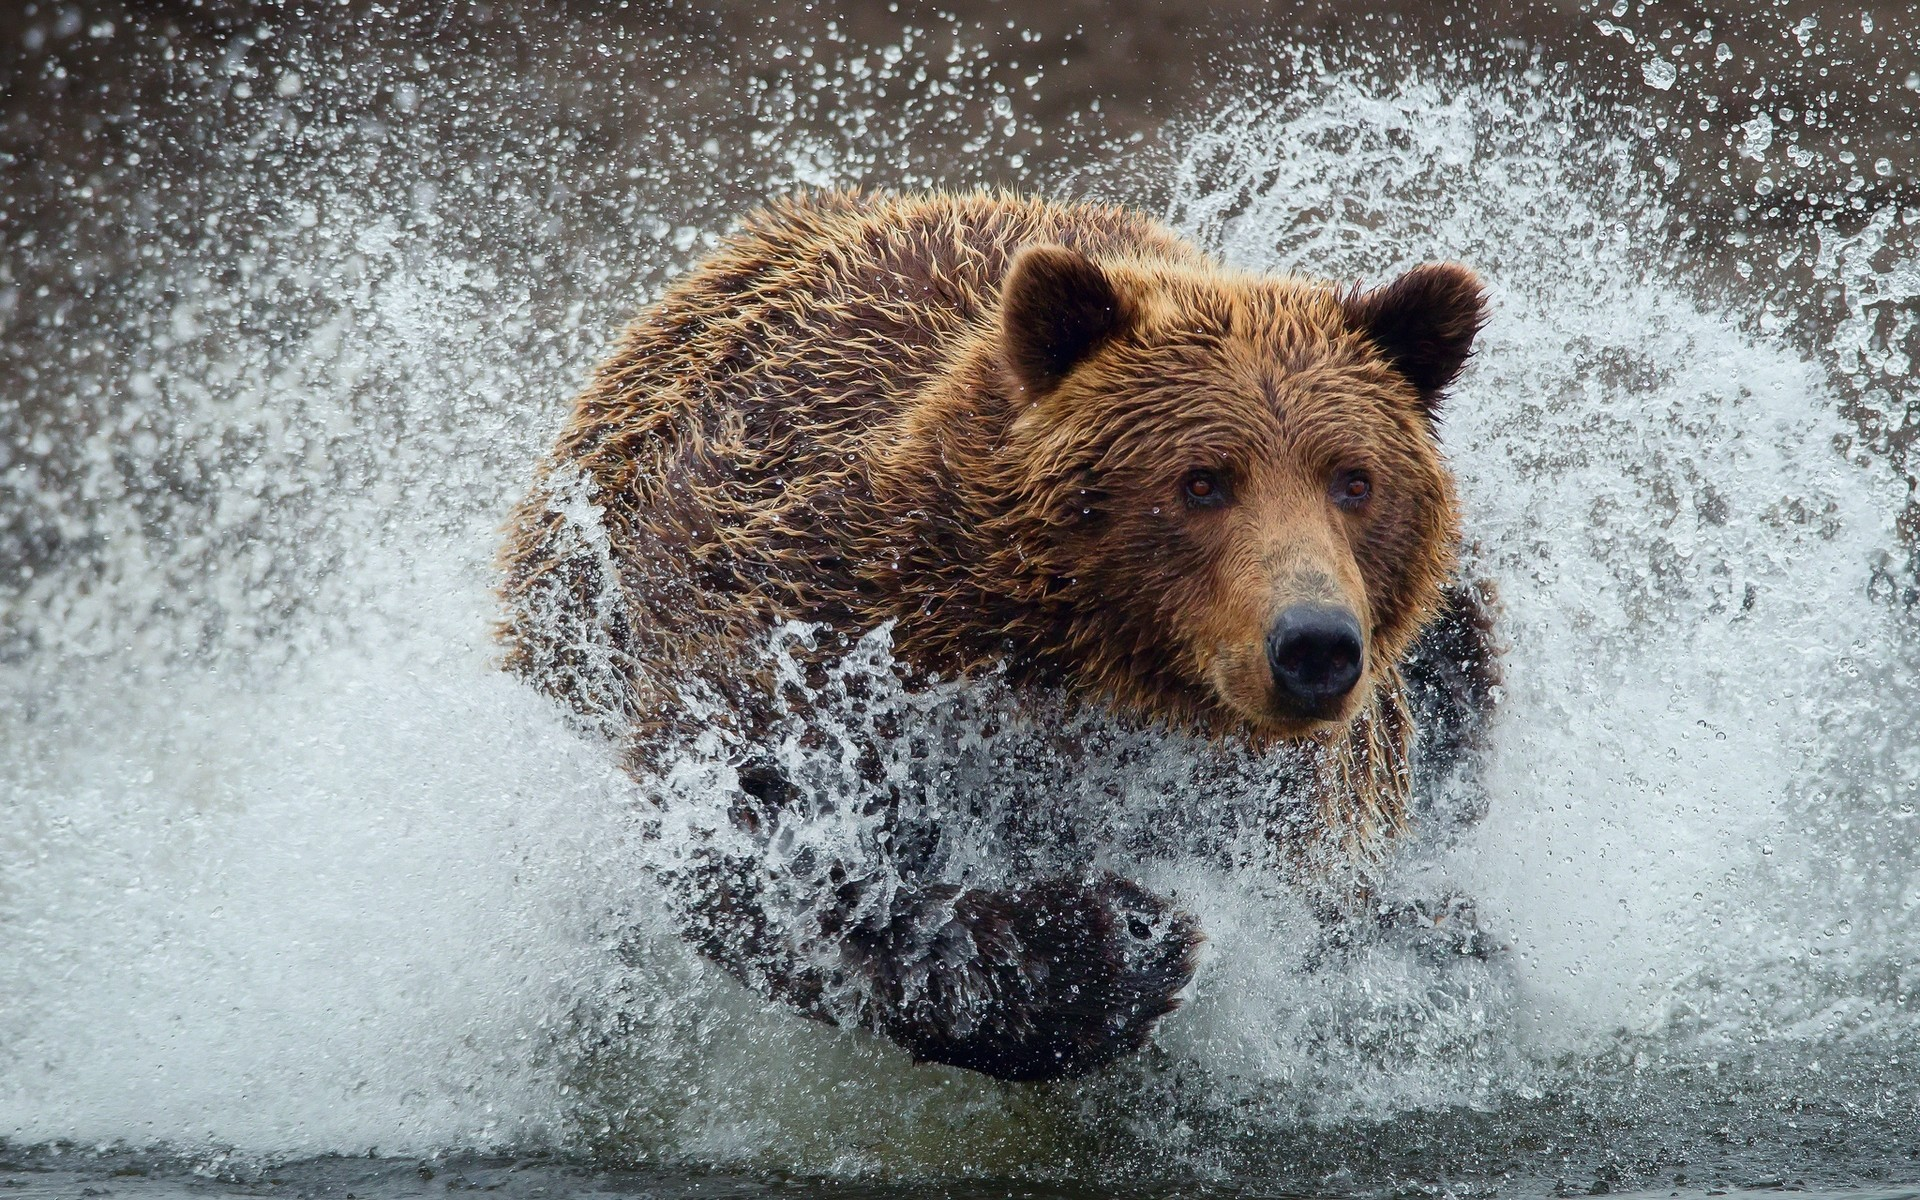 hd bear wallpaper, hug a bear day